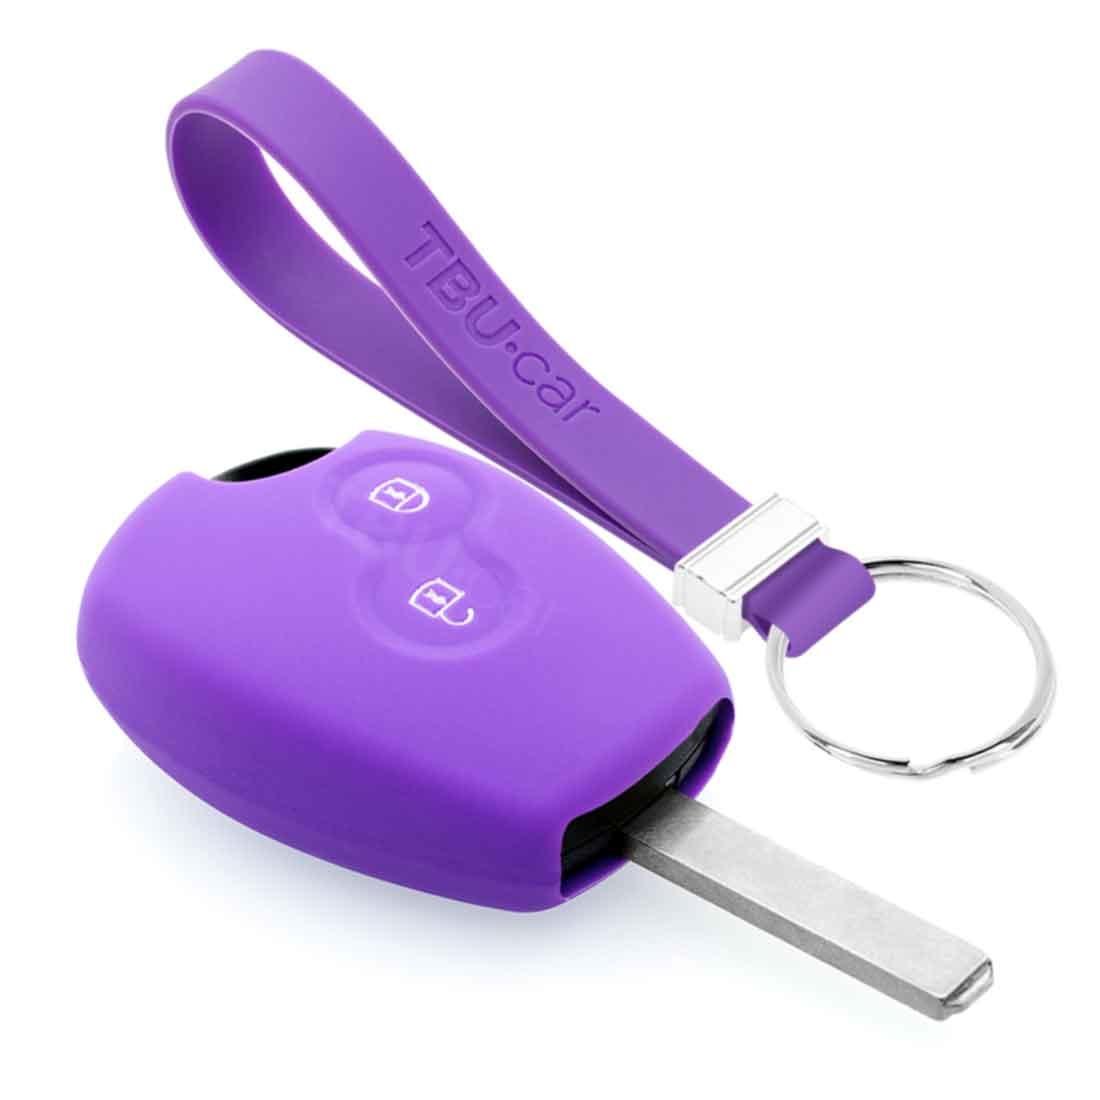 TBU car TBU car Autoschlüssel Hülle kompatibel mit Dacia 2 Tasten - Schutzhülle aus Silikon - Auto Schlüsselhülle Cover in Violett